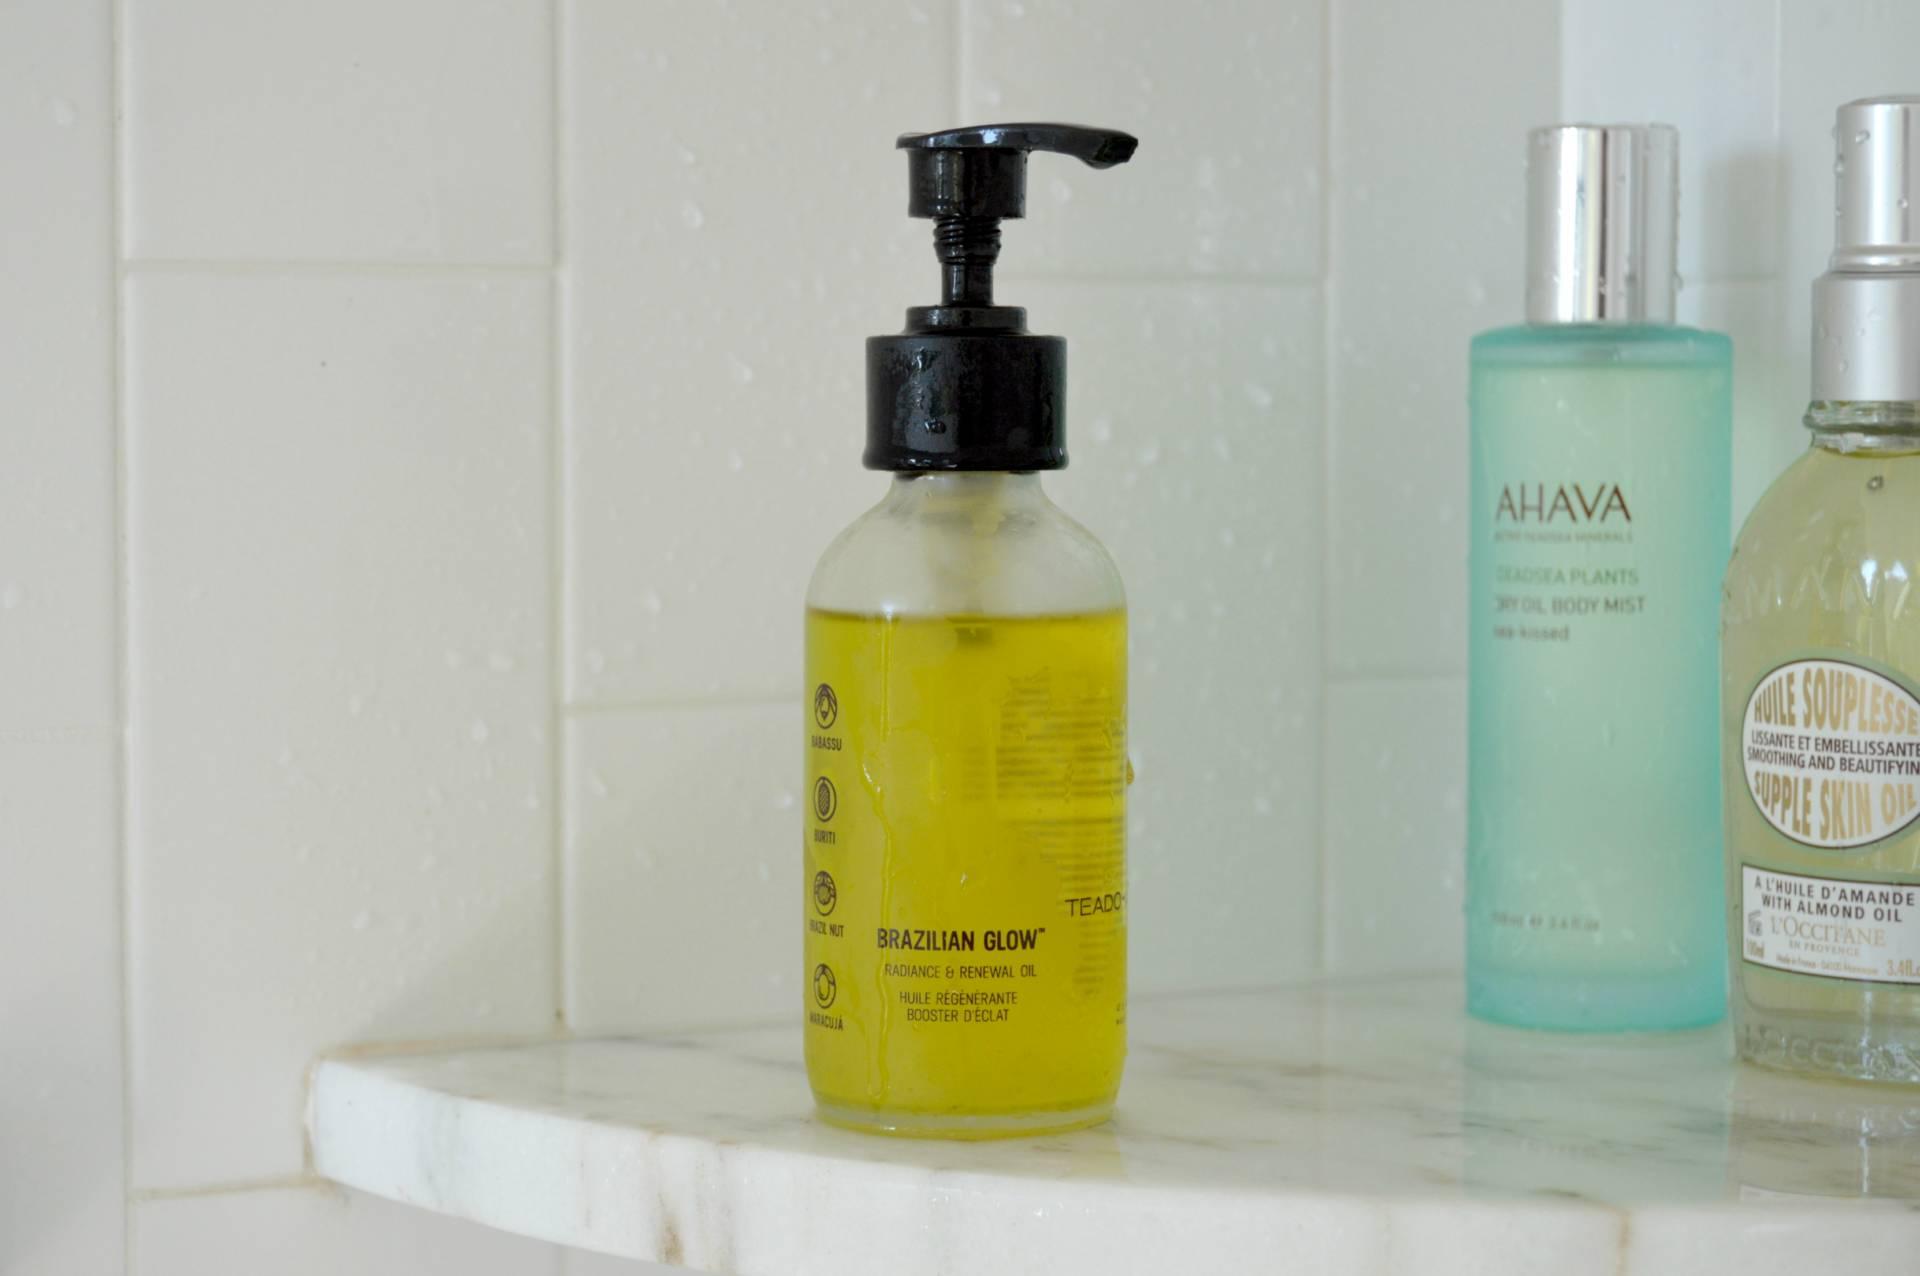 body oil brazilian glow teadora review inhautepursuit